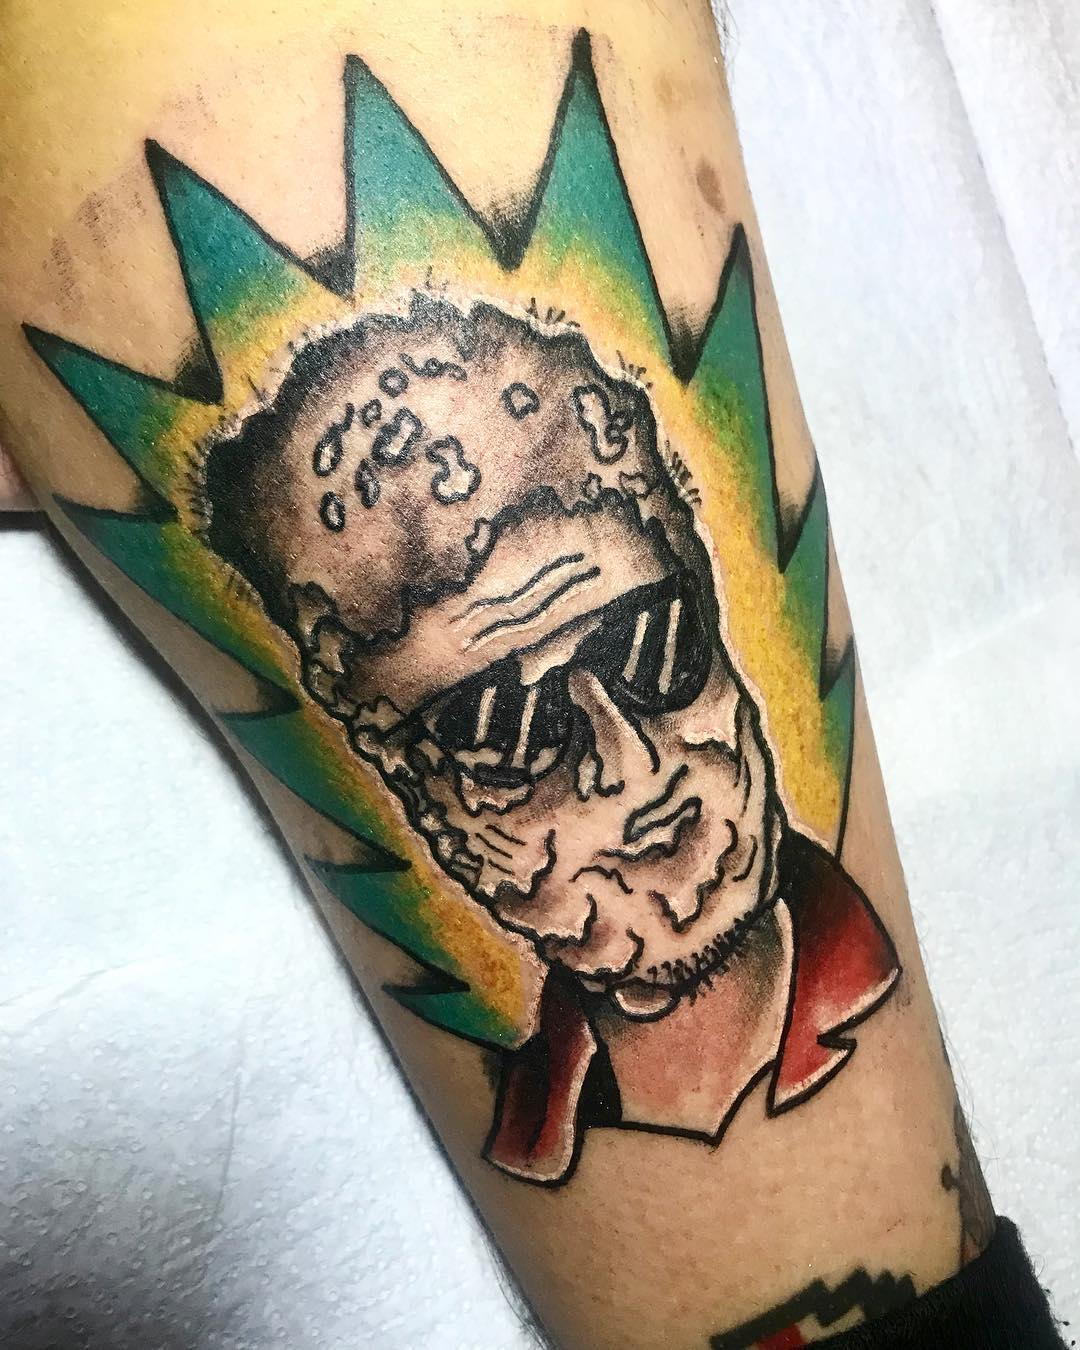 Cuando la cosa decaiga te haces un tatuaje de la Momia Fantástica